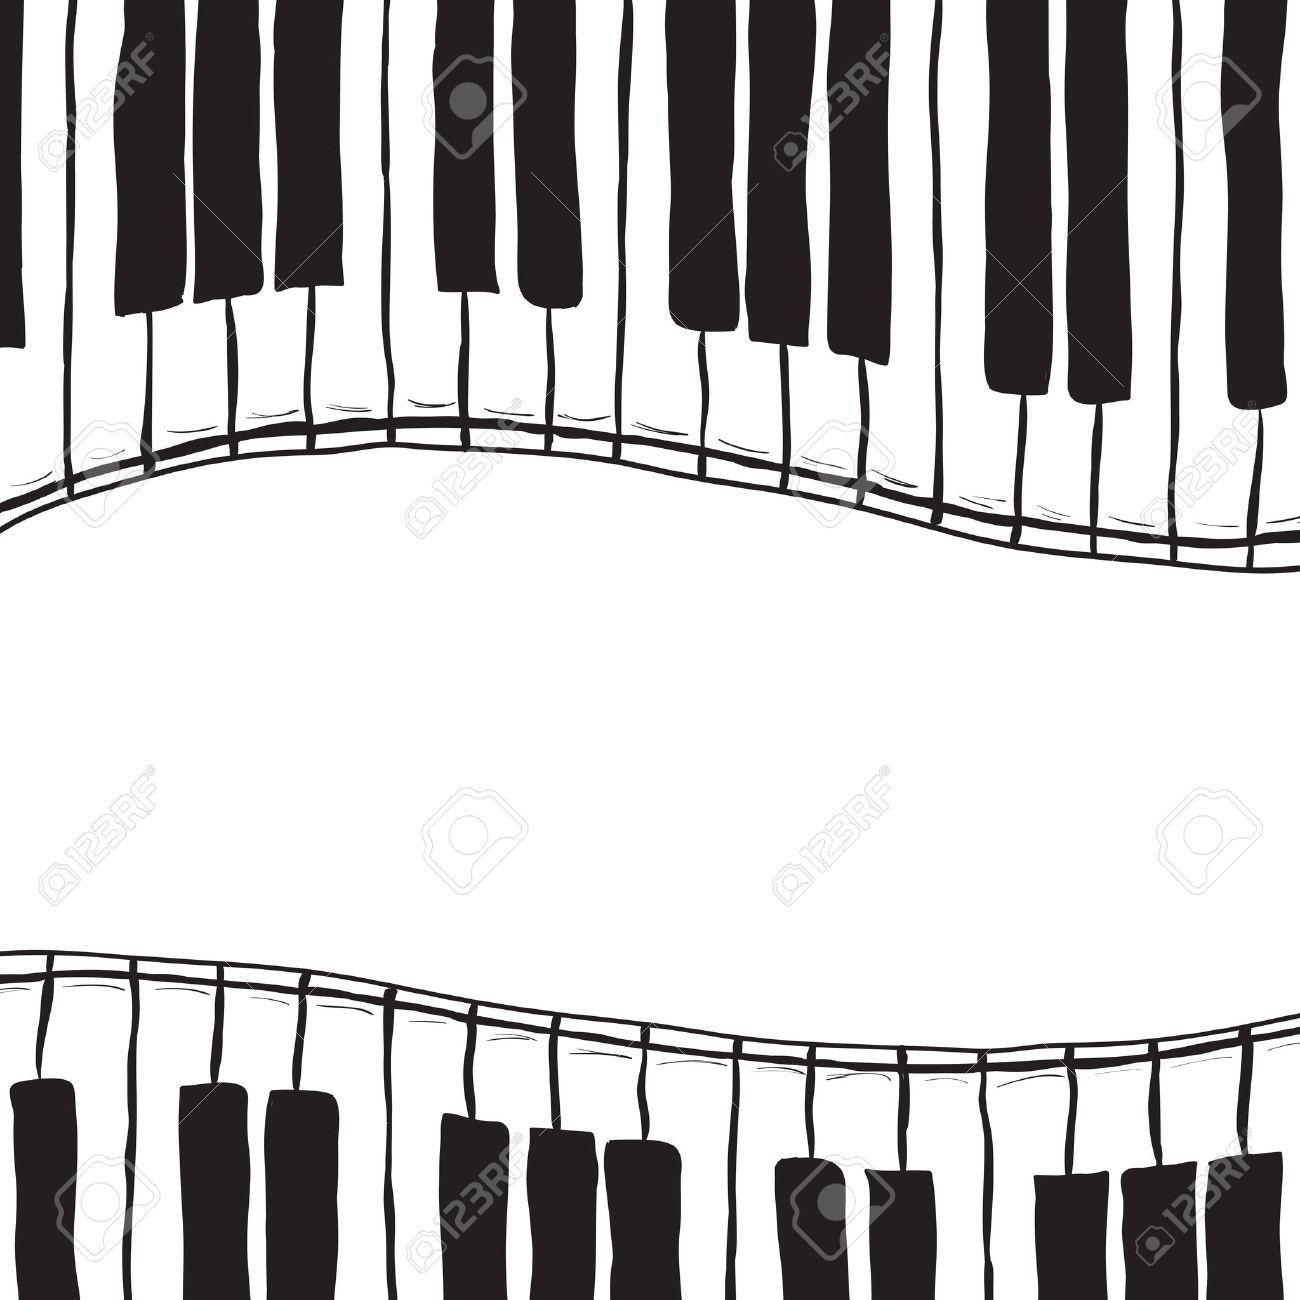 Illustration of piano keys - hand drawn style Stock Vector - 15130818